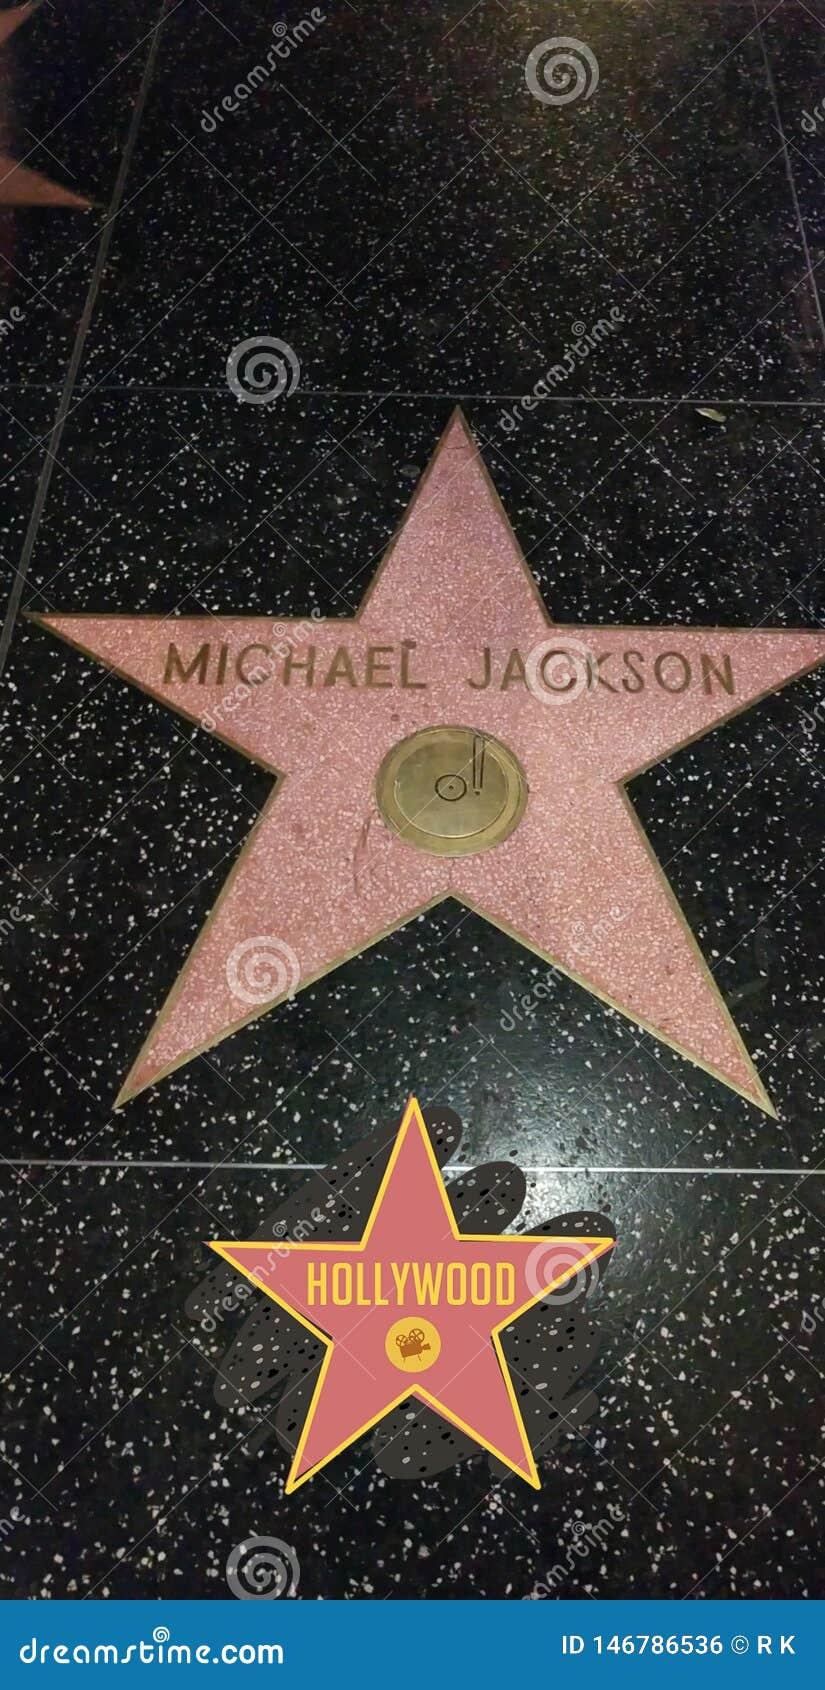 Michael jackson hollywood